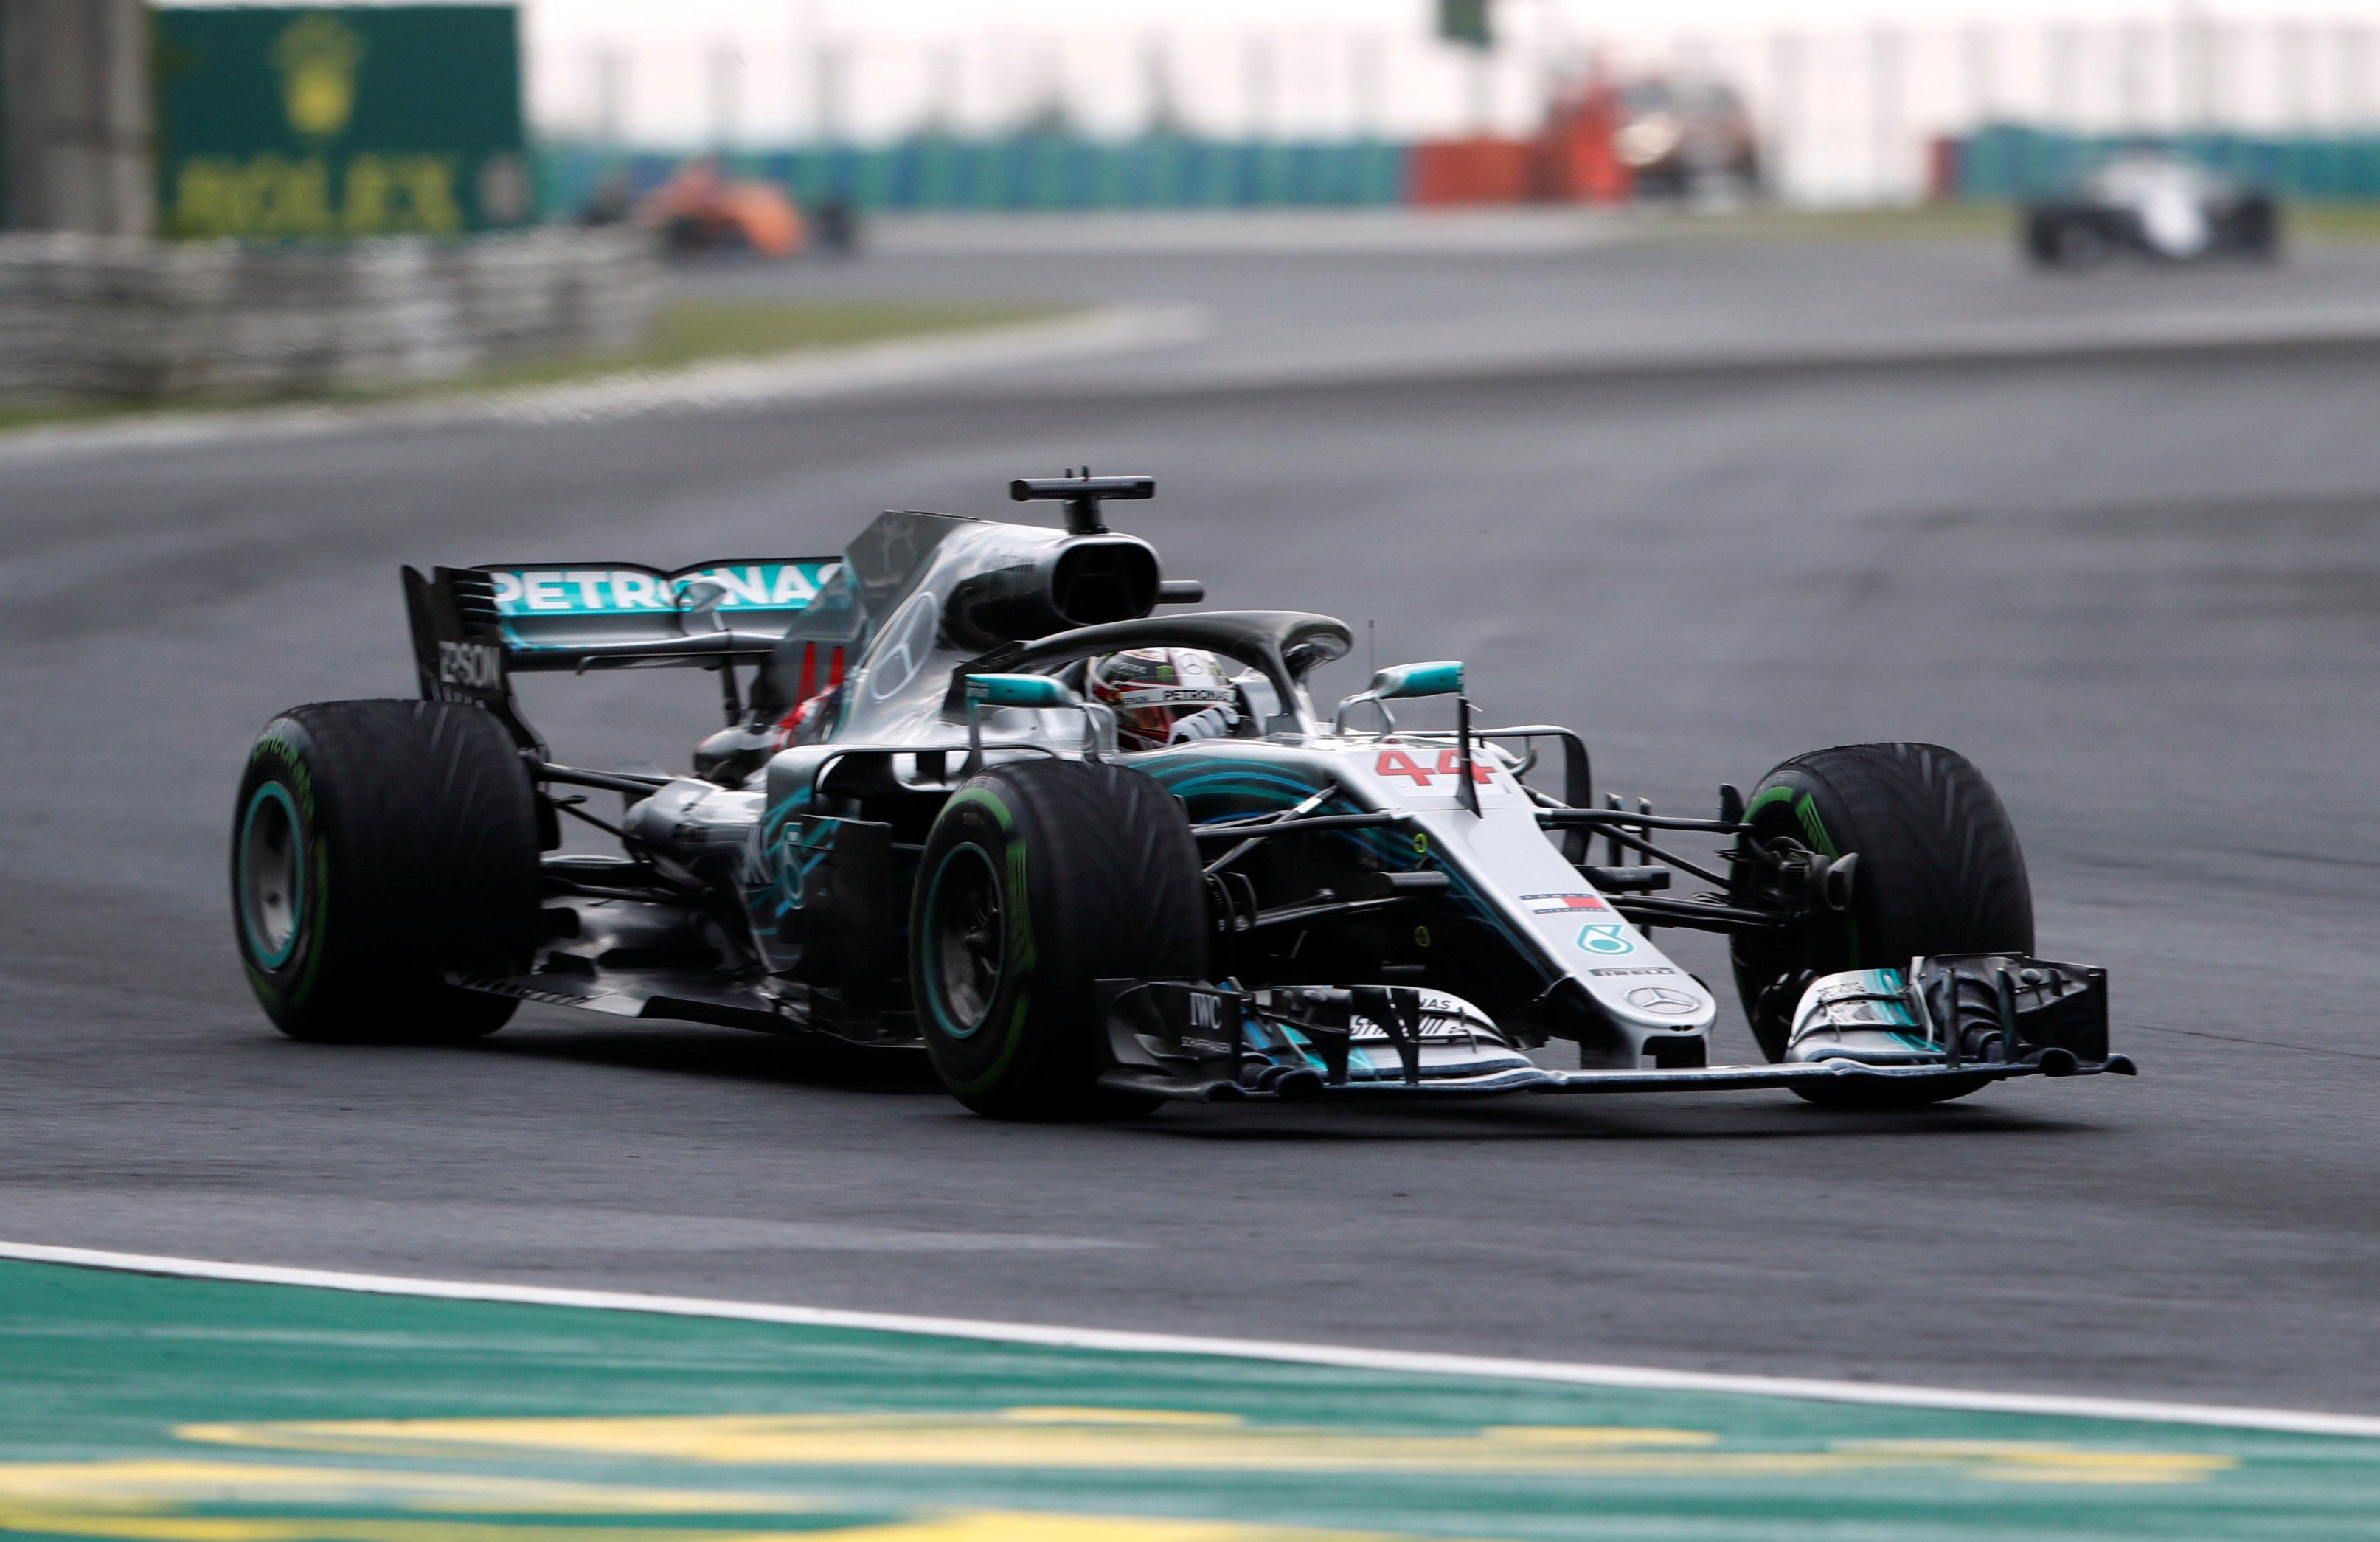 Hamilton left it late to claim pole, his fifth of the season